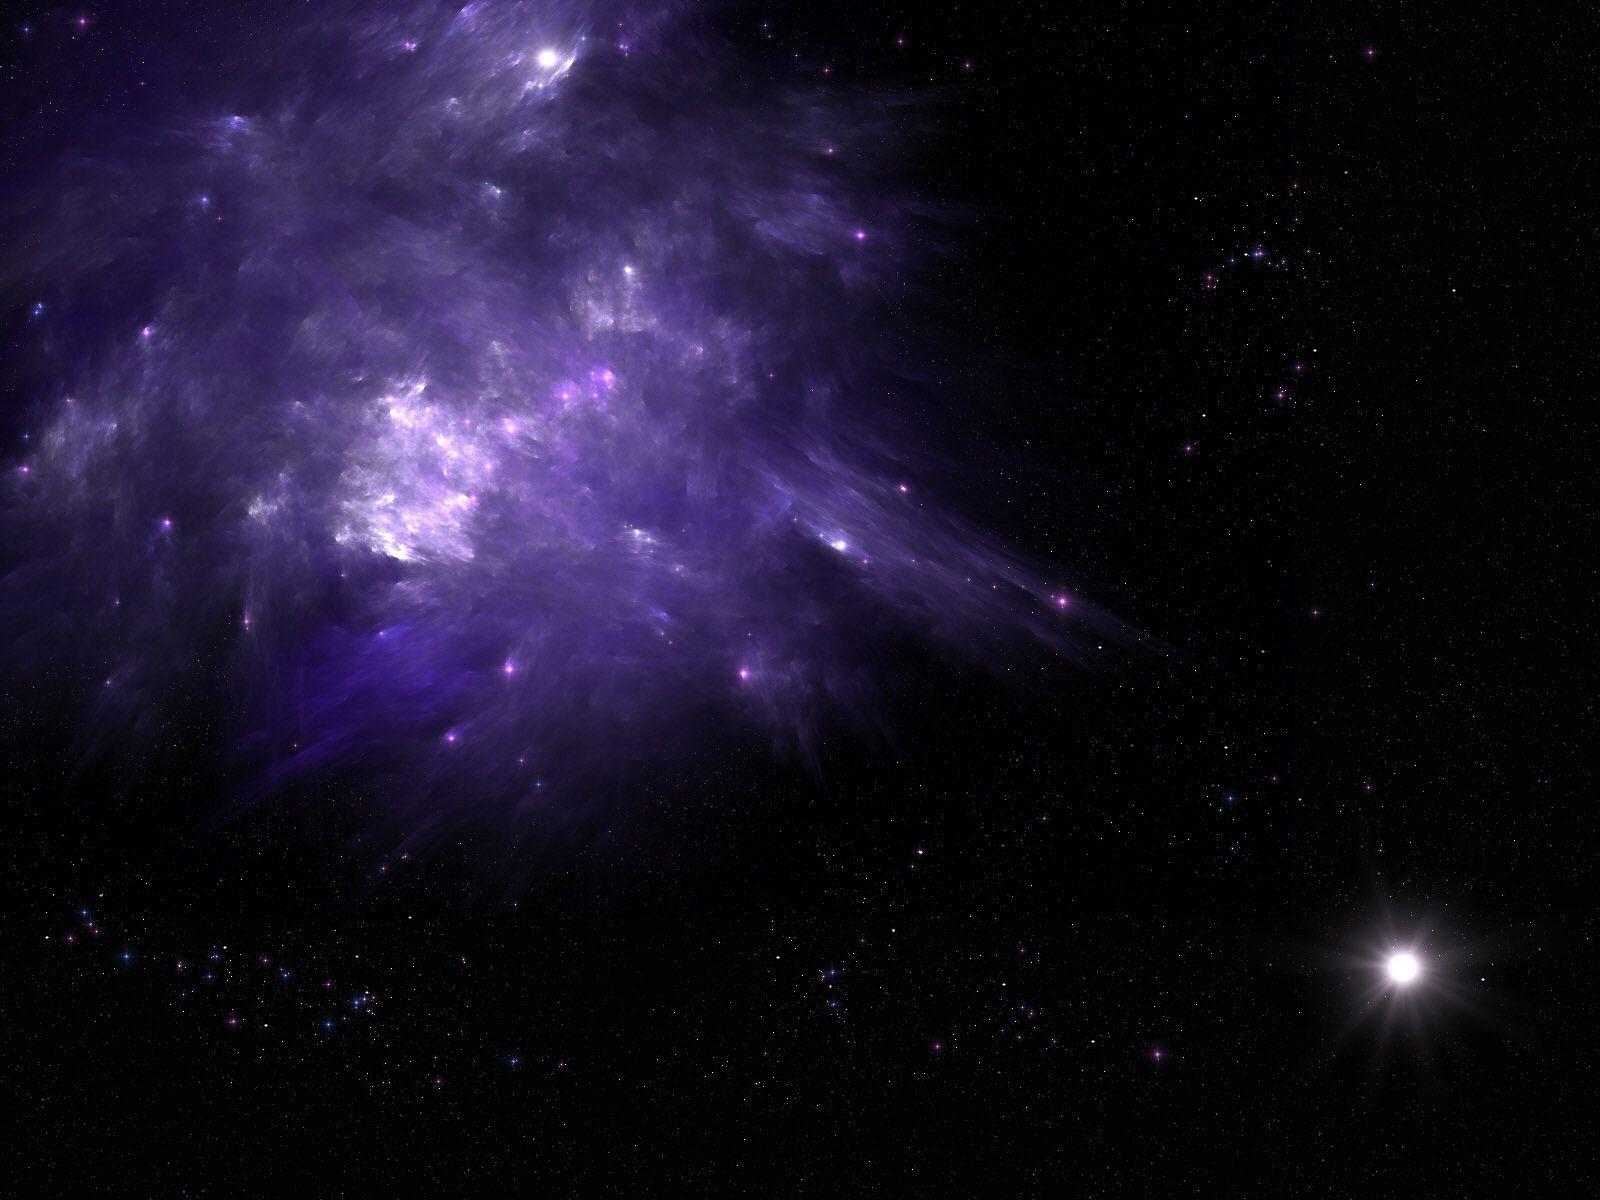 hd purple galaxy wallpaper - photo #21